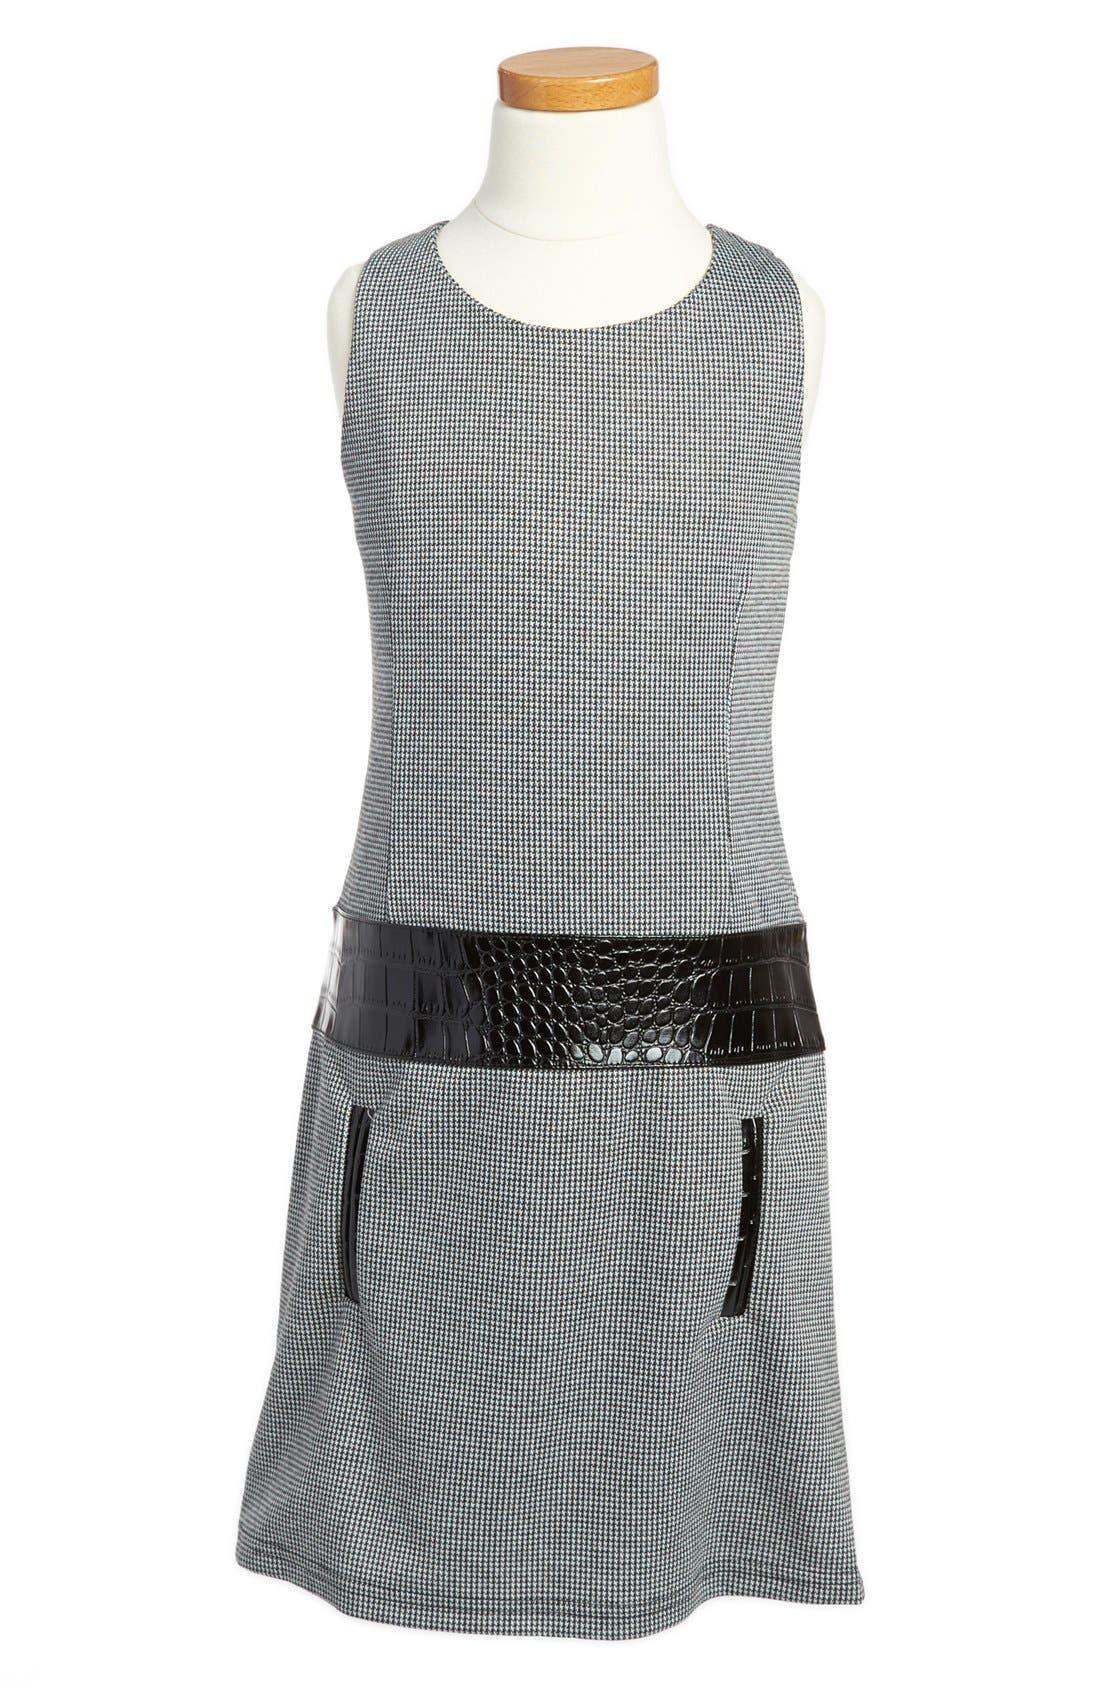 Main Image - Laundry by Shelli Segal Drop Waist Dress